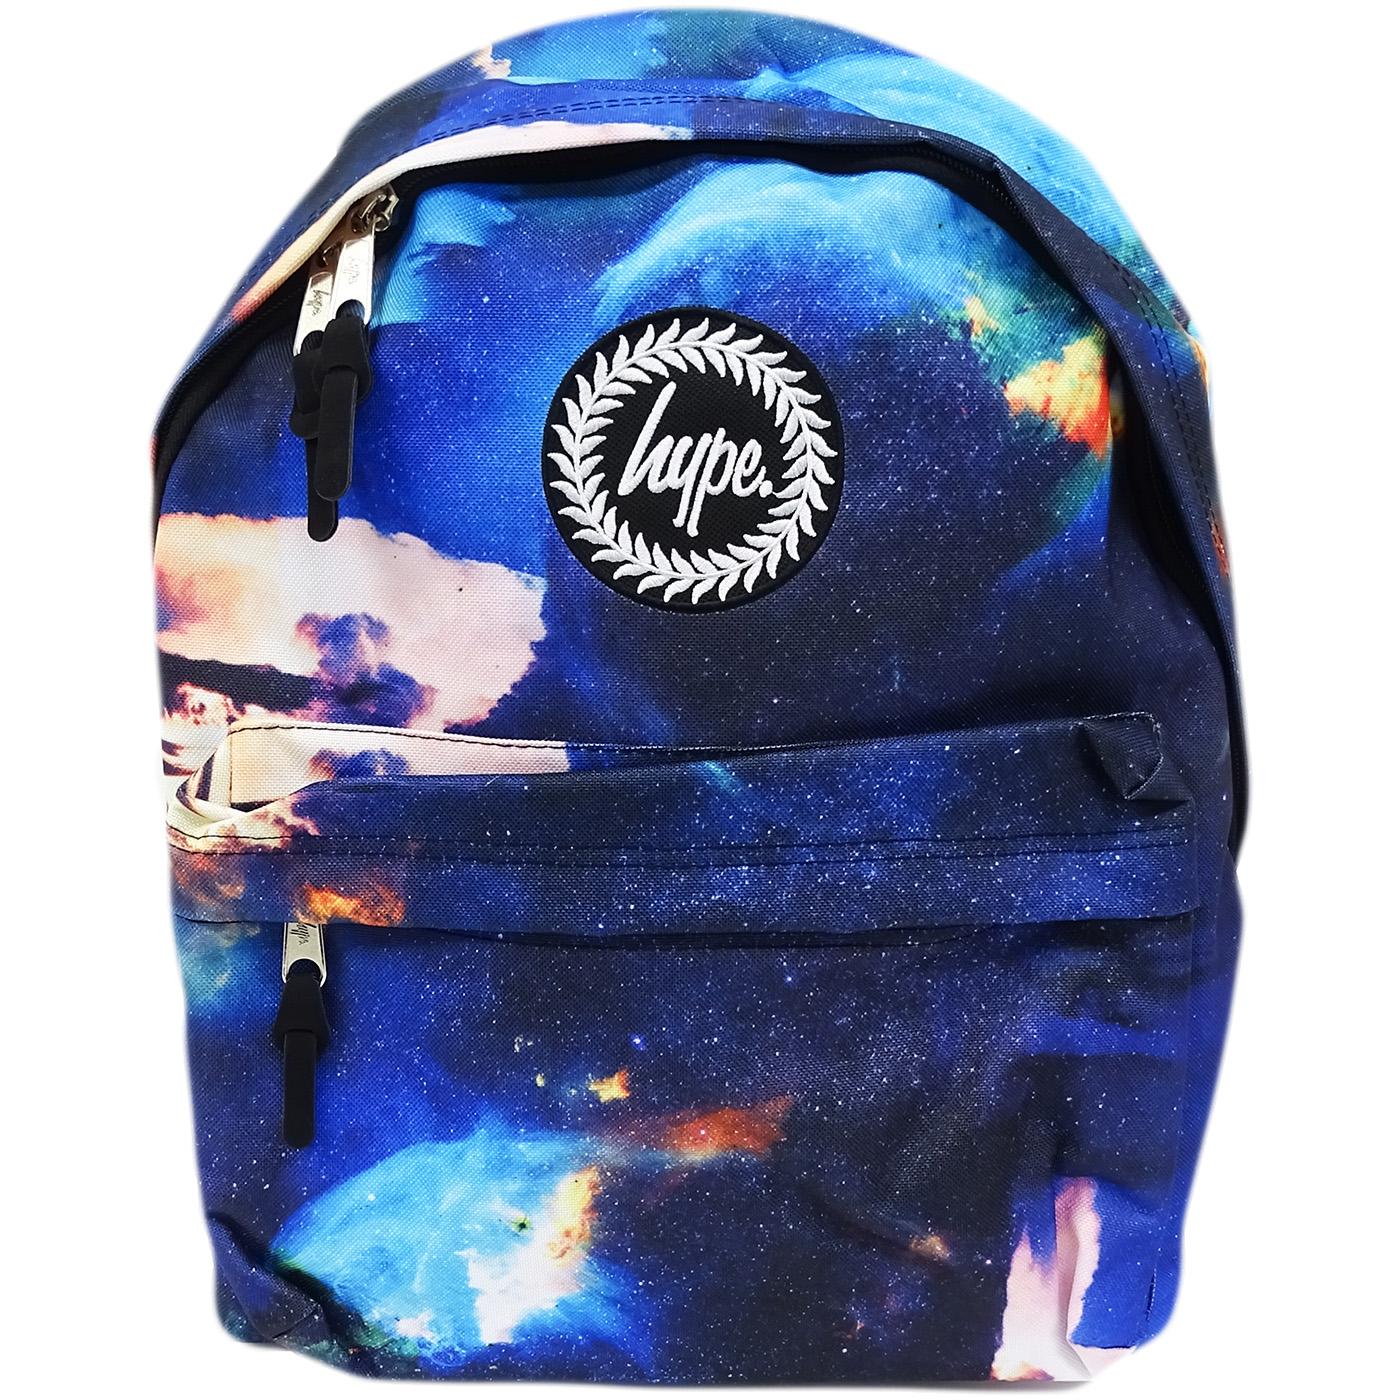 Hype Space Backpack Bag  - Jupiter Space